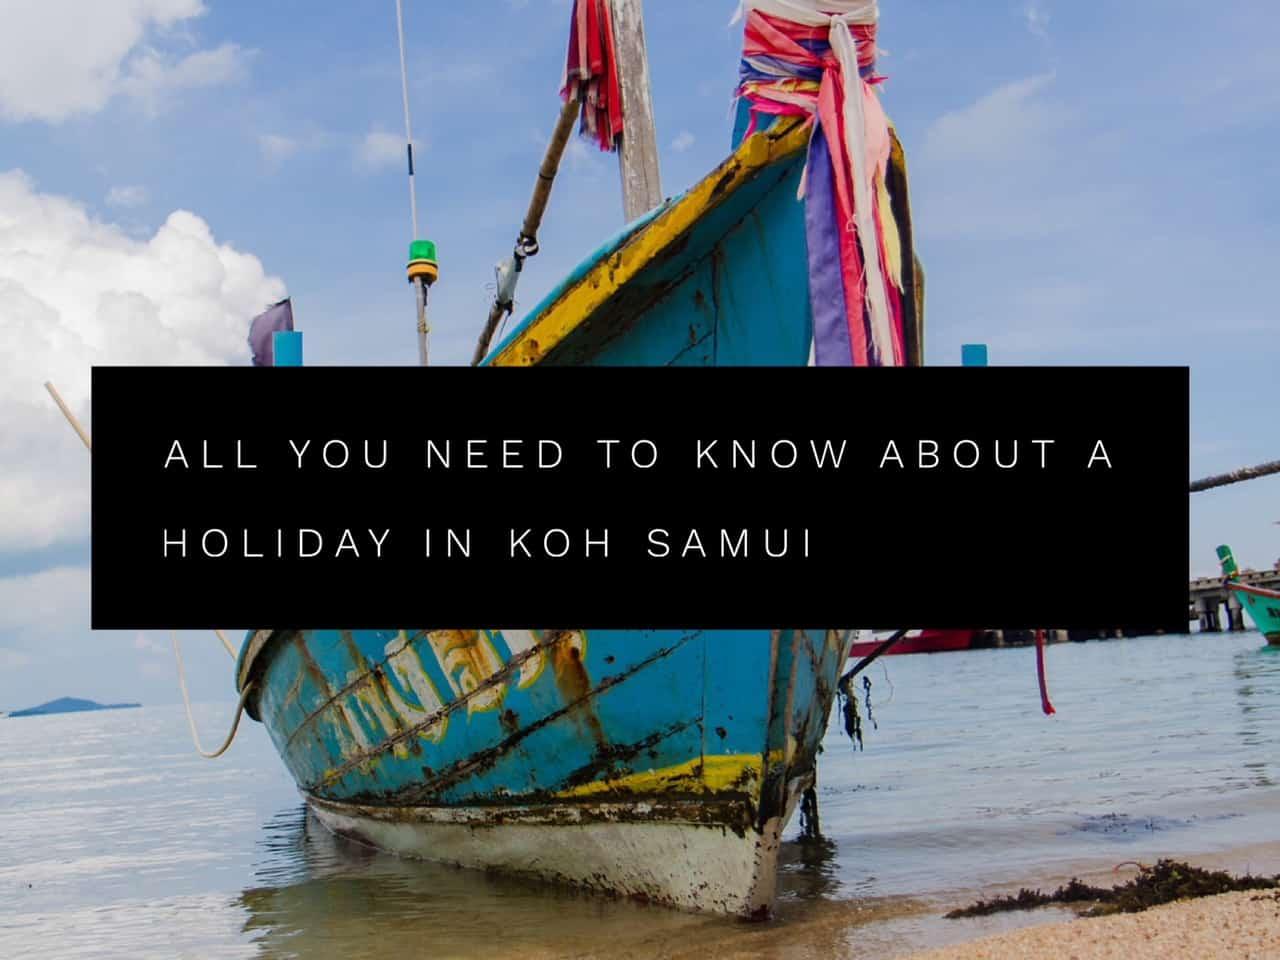 Holiday in Koh Samui